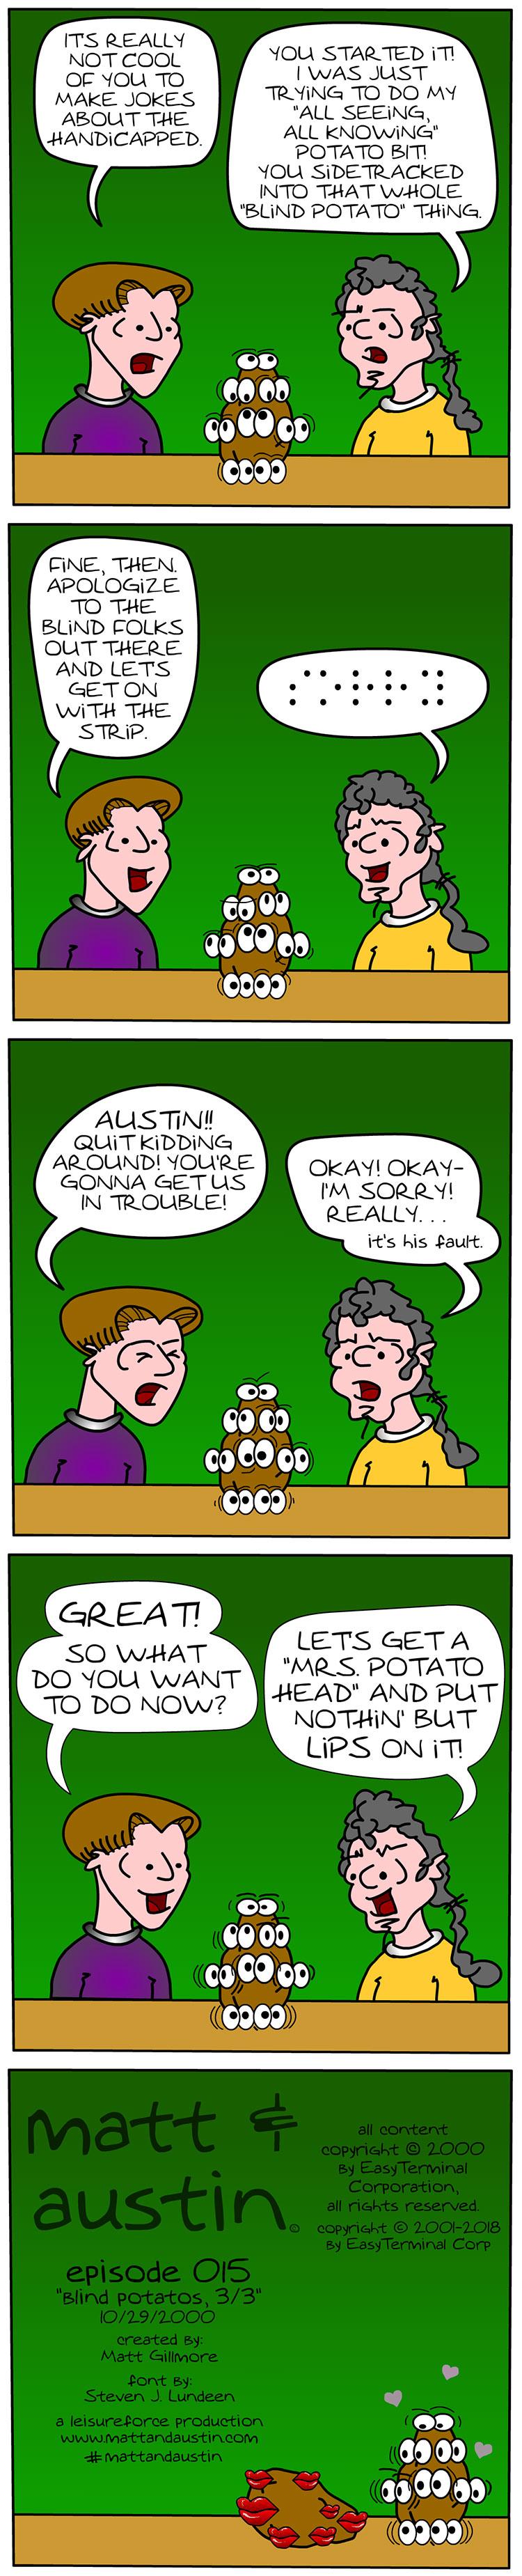 Webcomic The Matt And Austin Comic Strip #015 Blind Potatoes 3 of 3